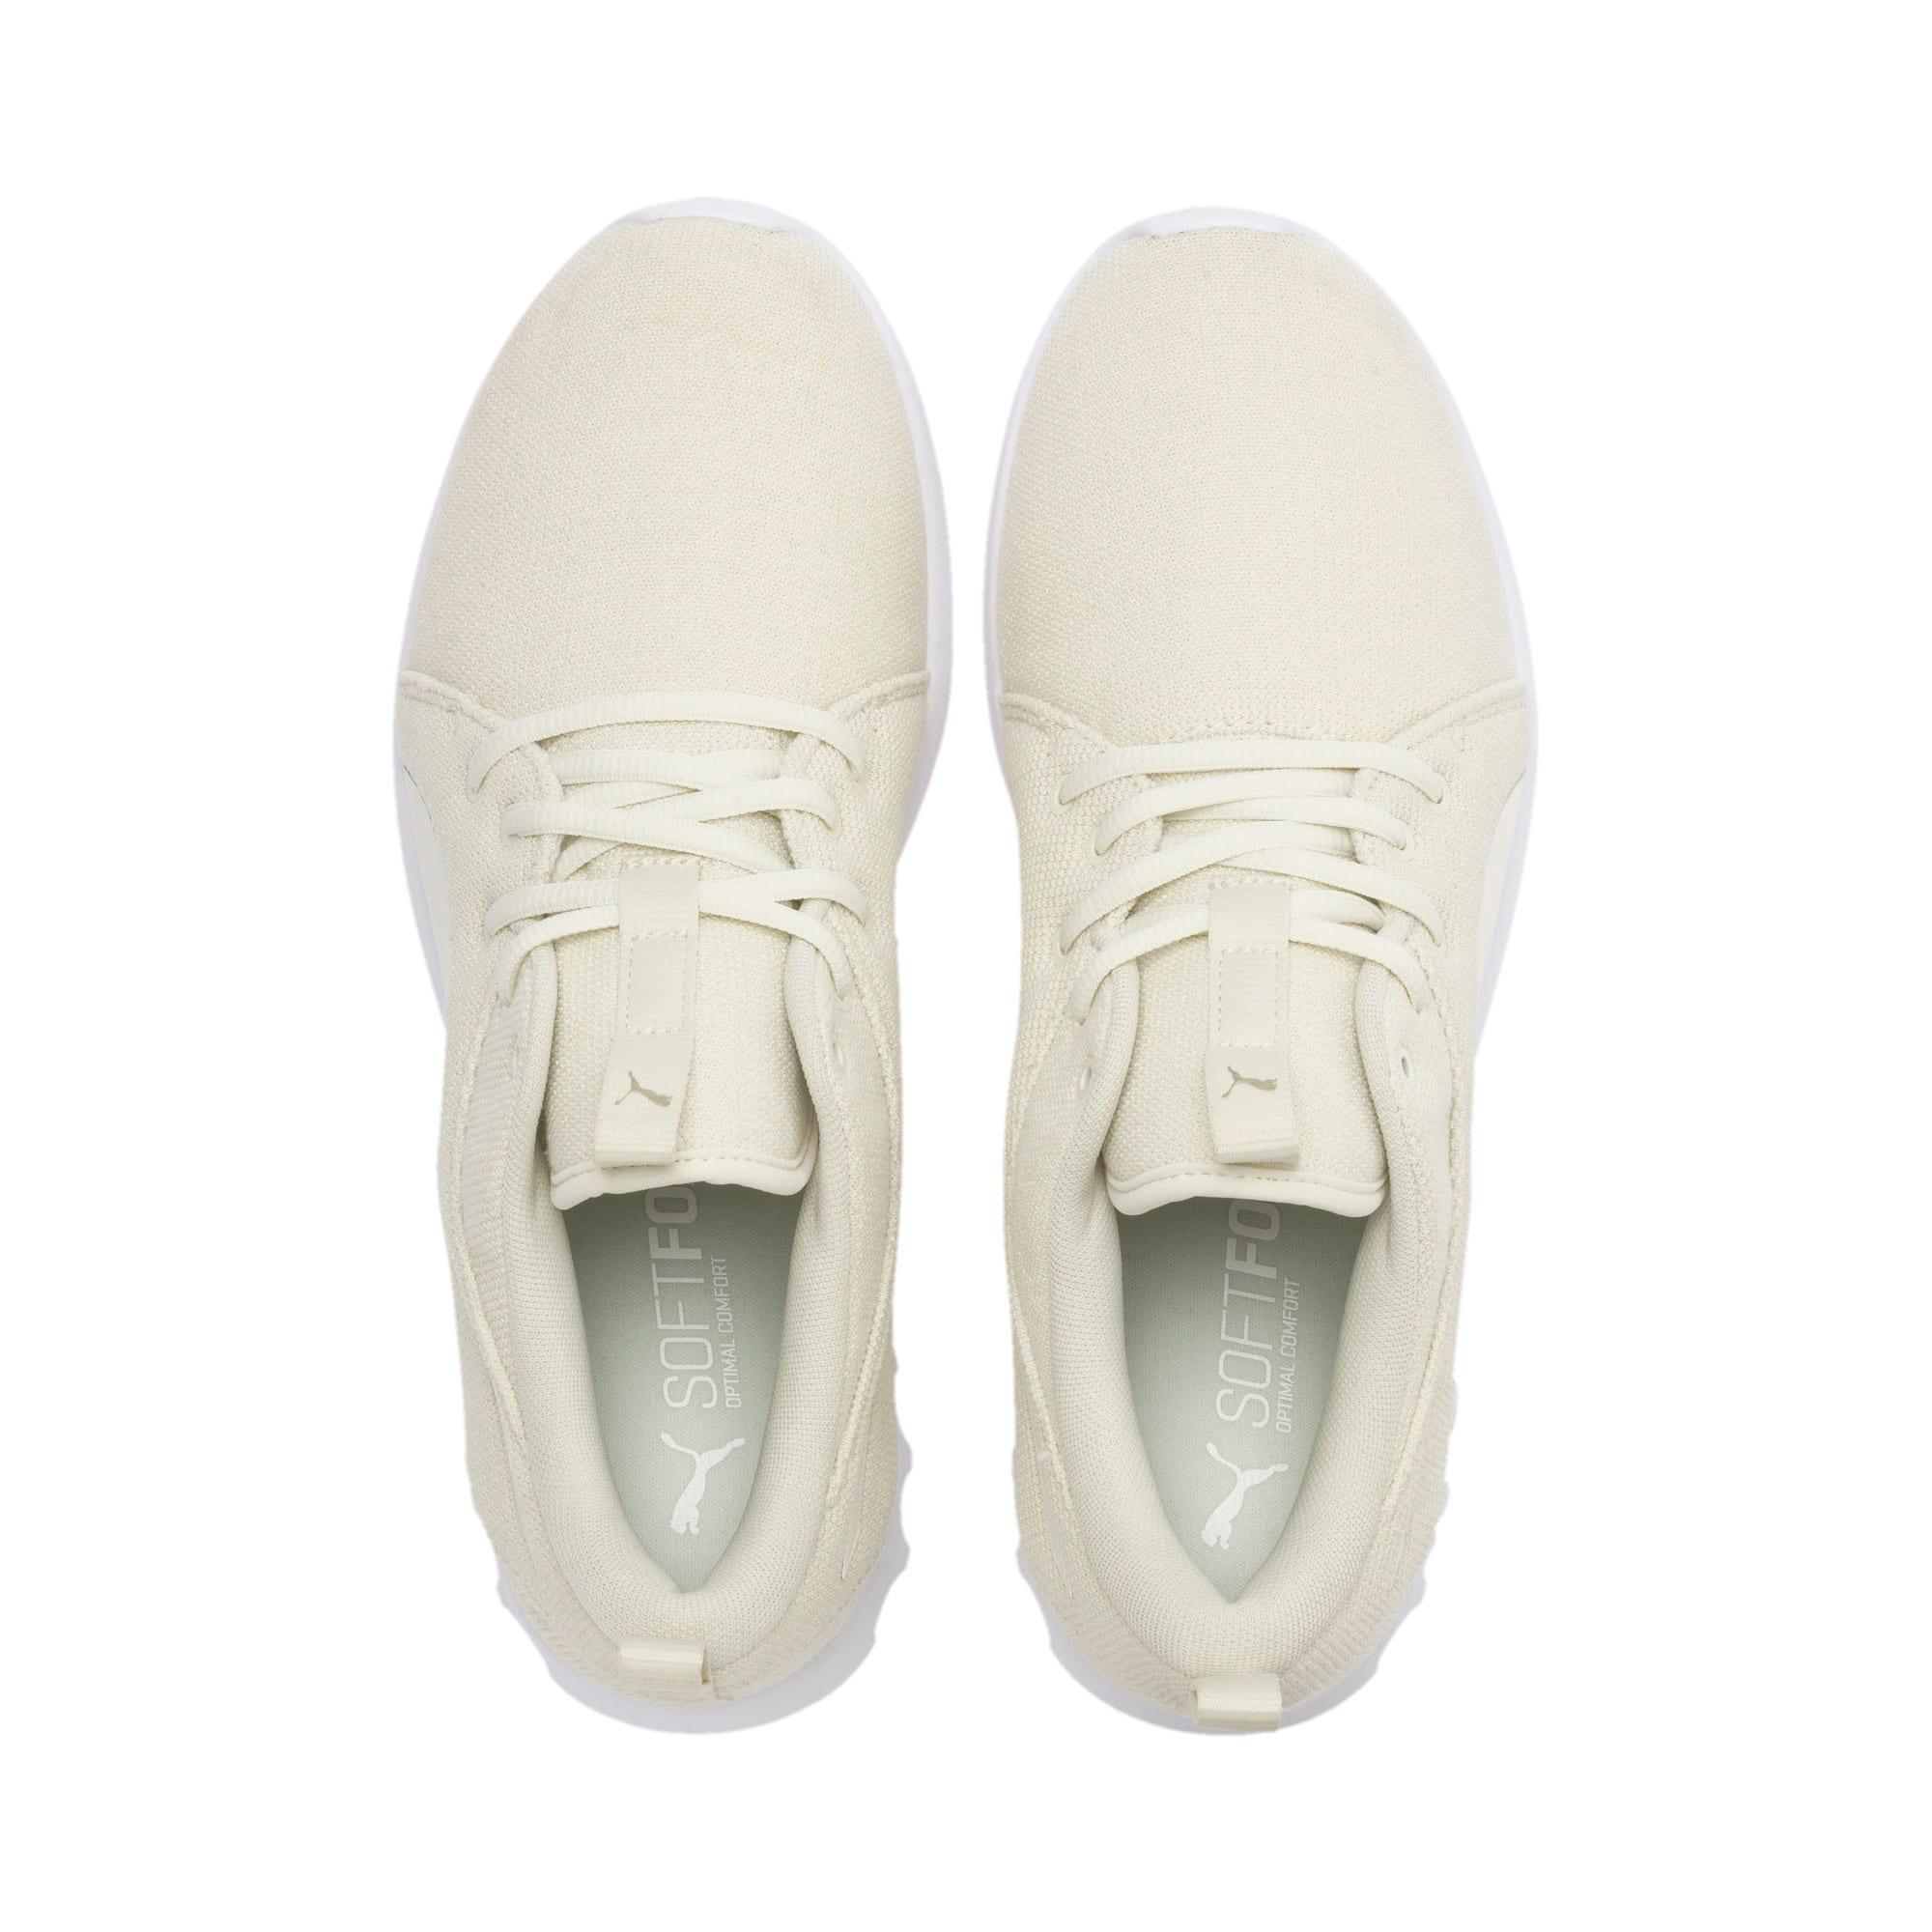 Thumbnail 6 of Carson 2 Knit Men's Training Shoes, White-Whisper White-Gold, medium